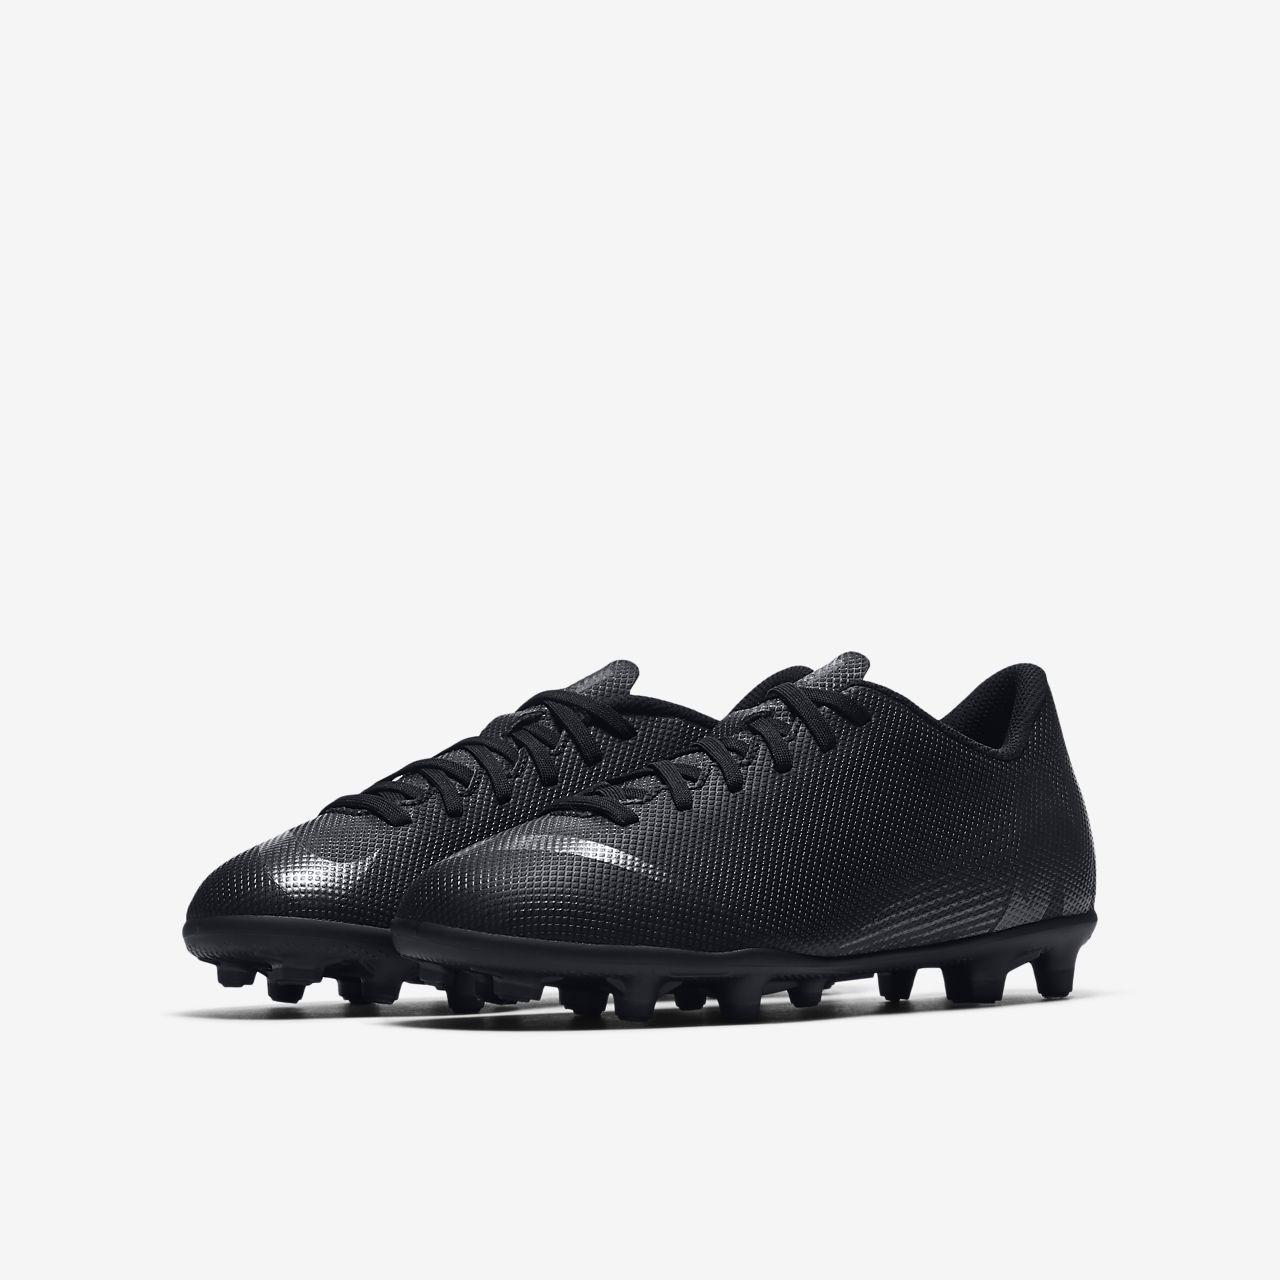 5d38100abcaca ... Nike Jr. Vapor 12 Club MG Botas de fútbol para múltiples superficies -  Niño